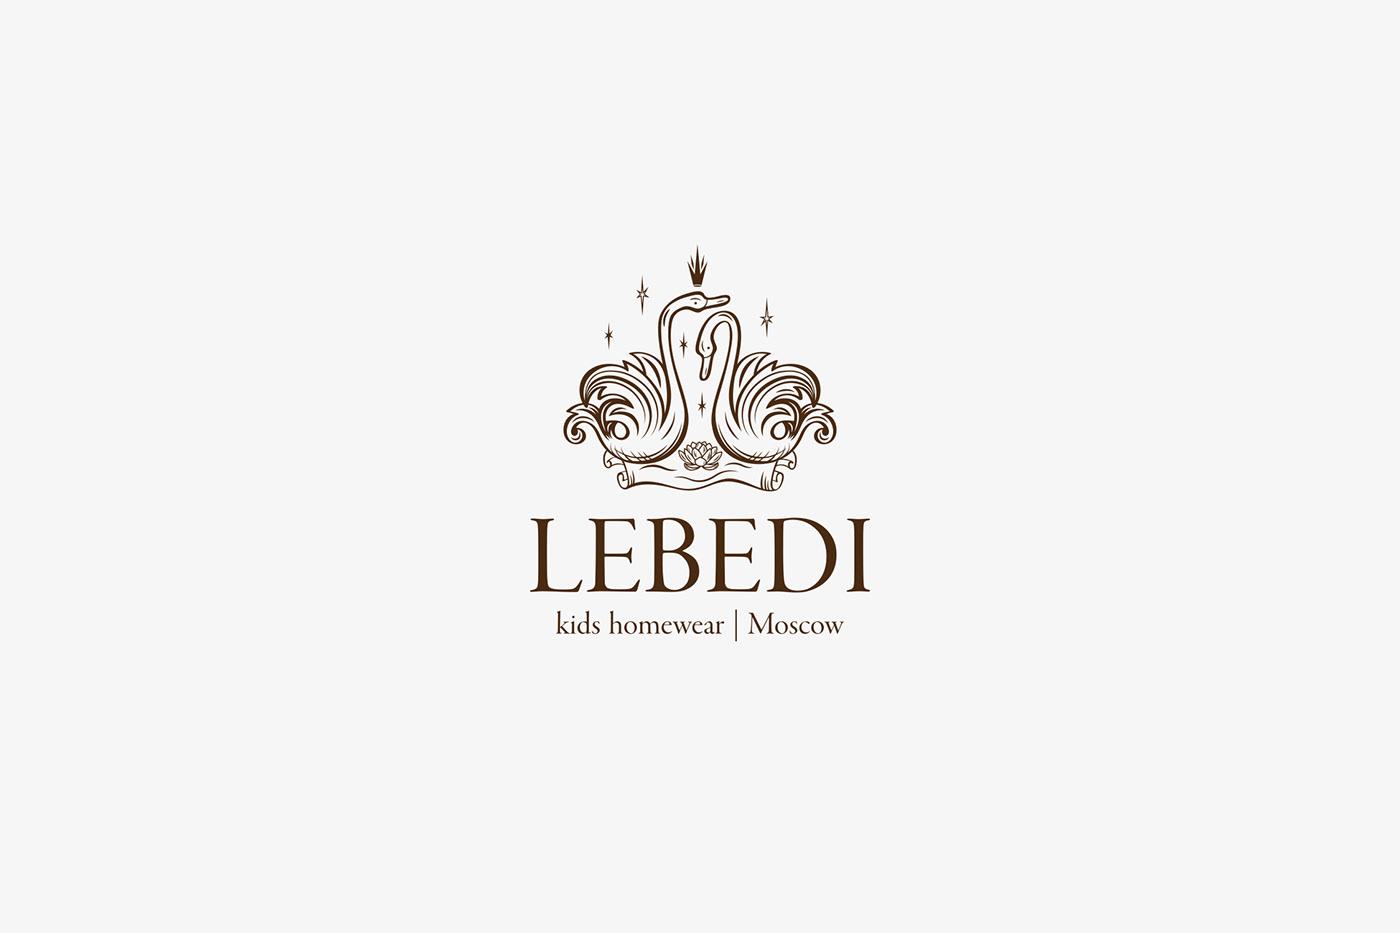 logo  lebedi logo swan homewear kids wear lebedi